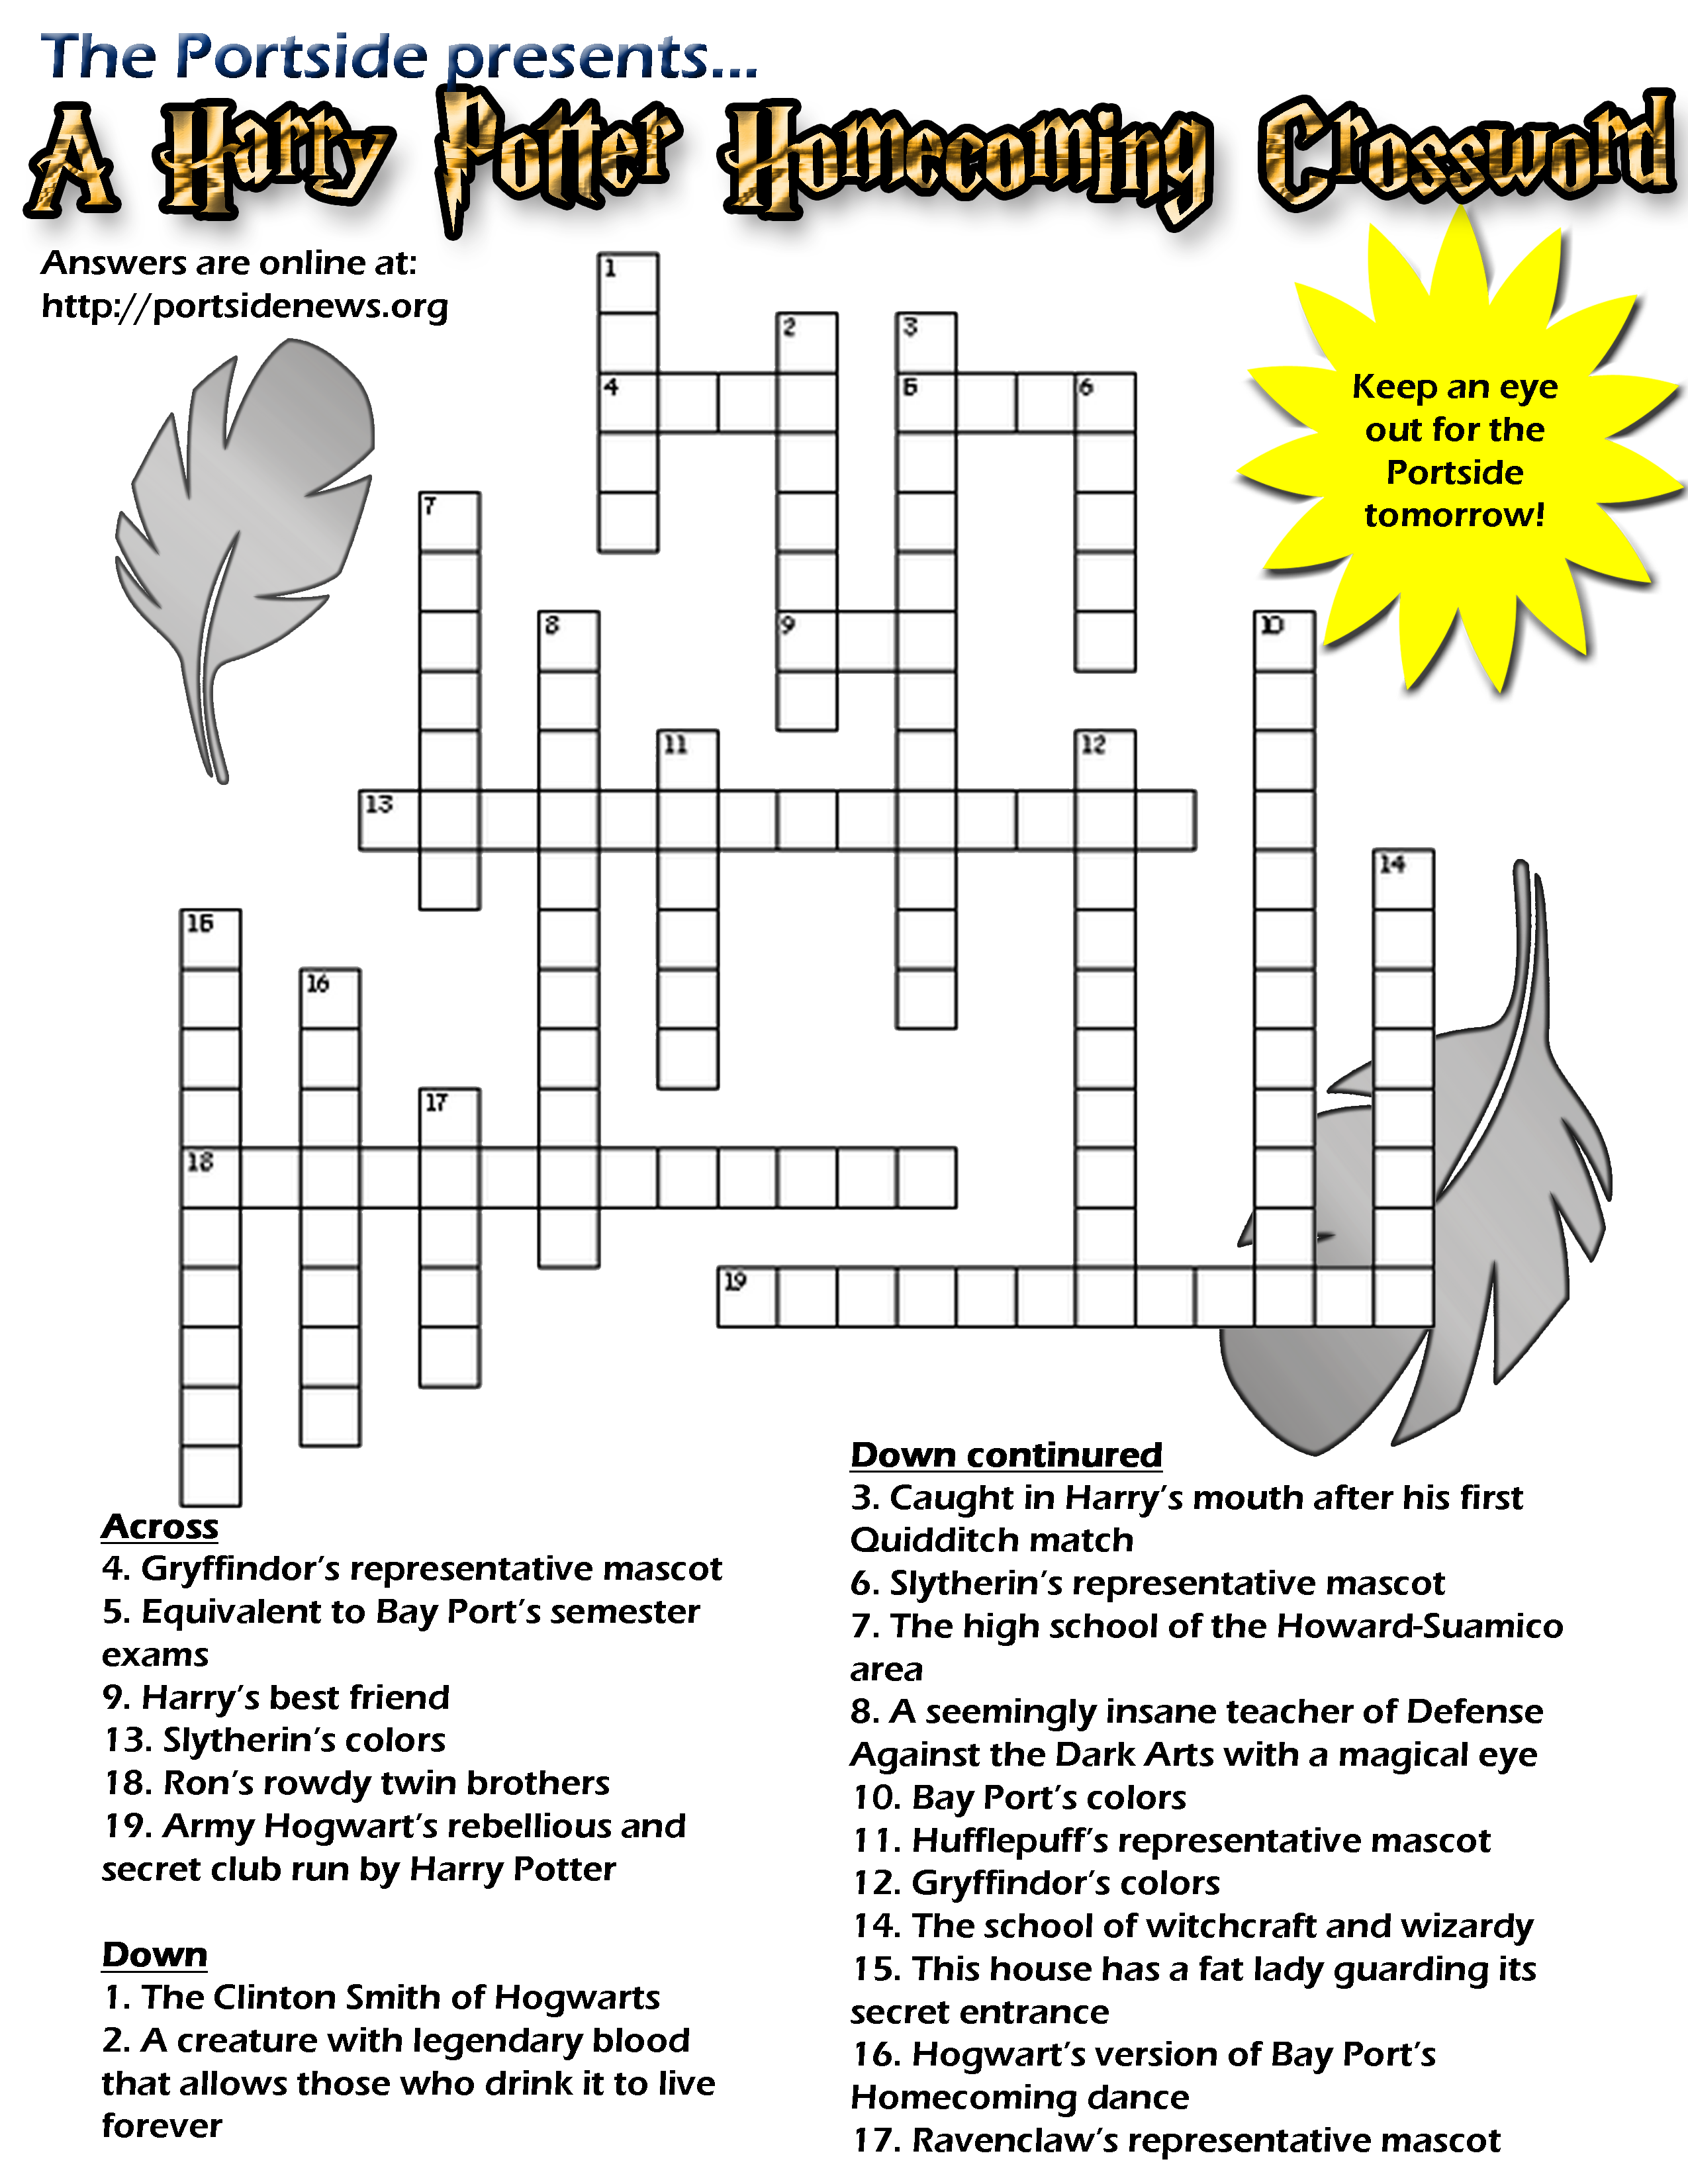 Harry Potter Printable Crossword Puzzle